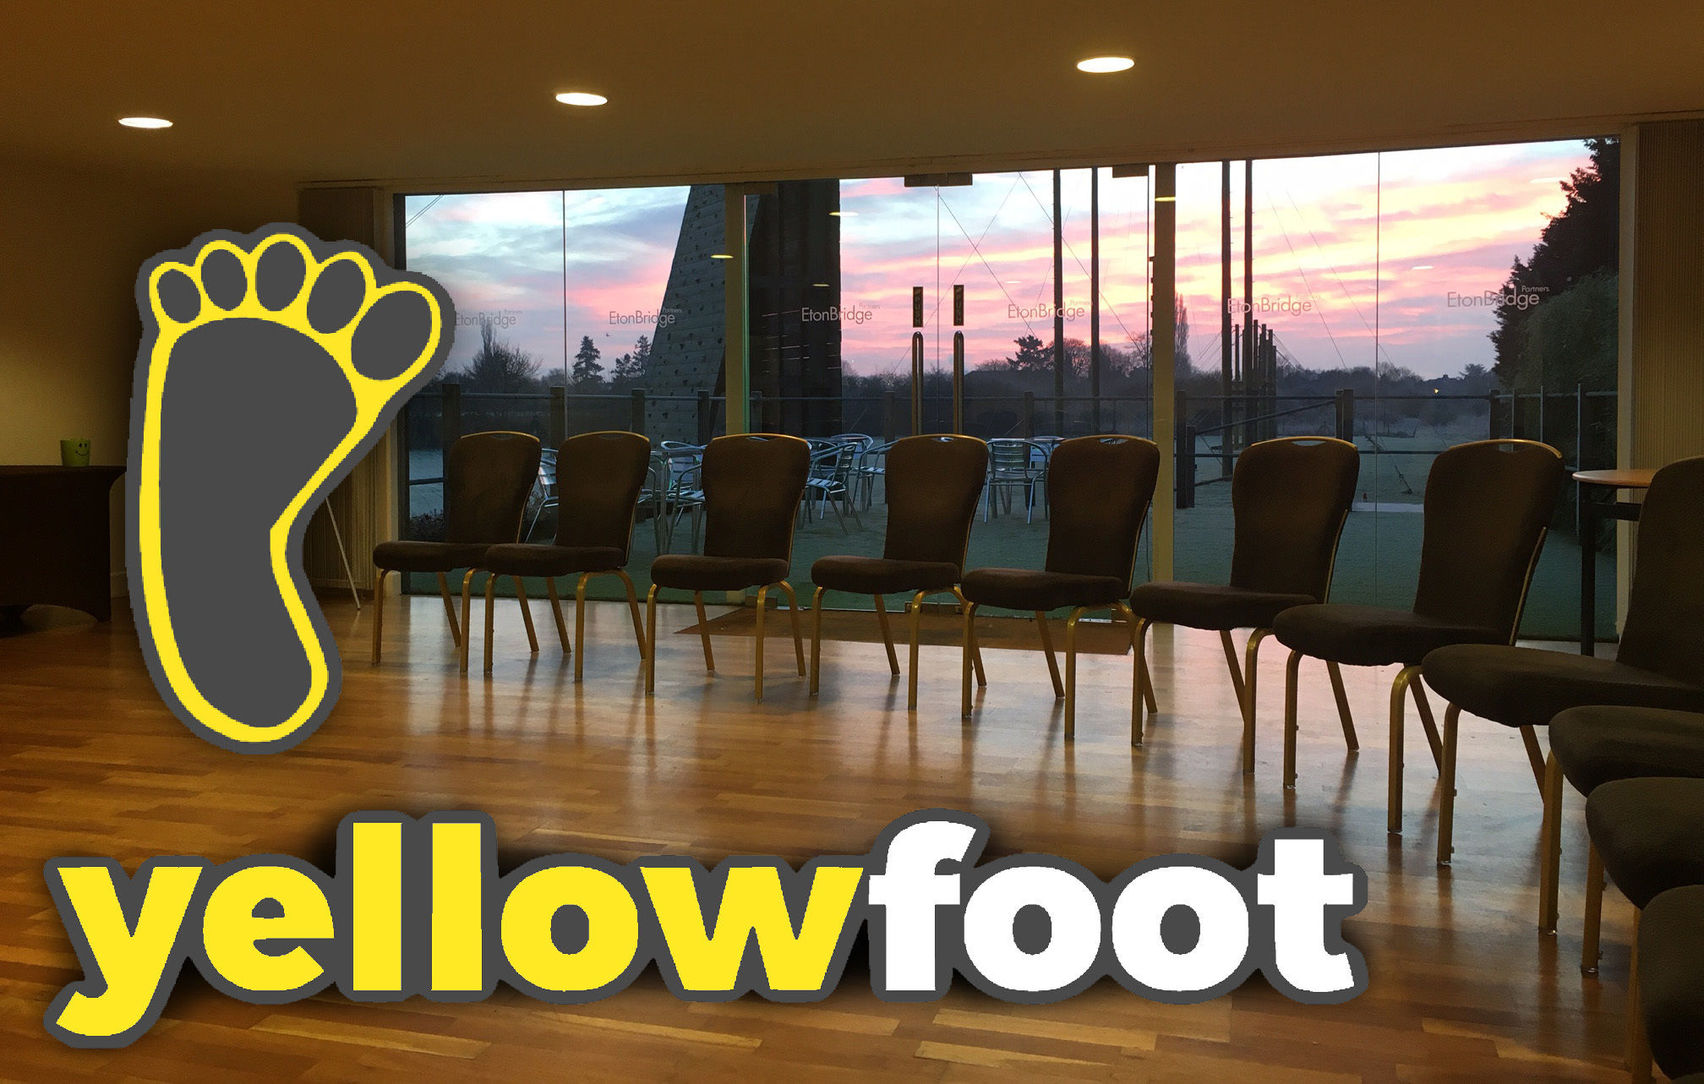 Yellowfoot Lodge - Conference Venue, Yellowfoot